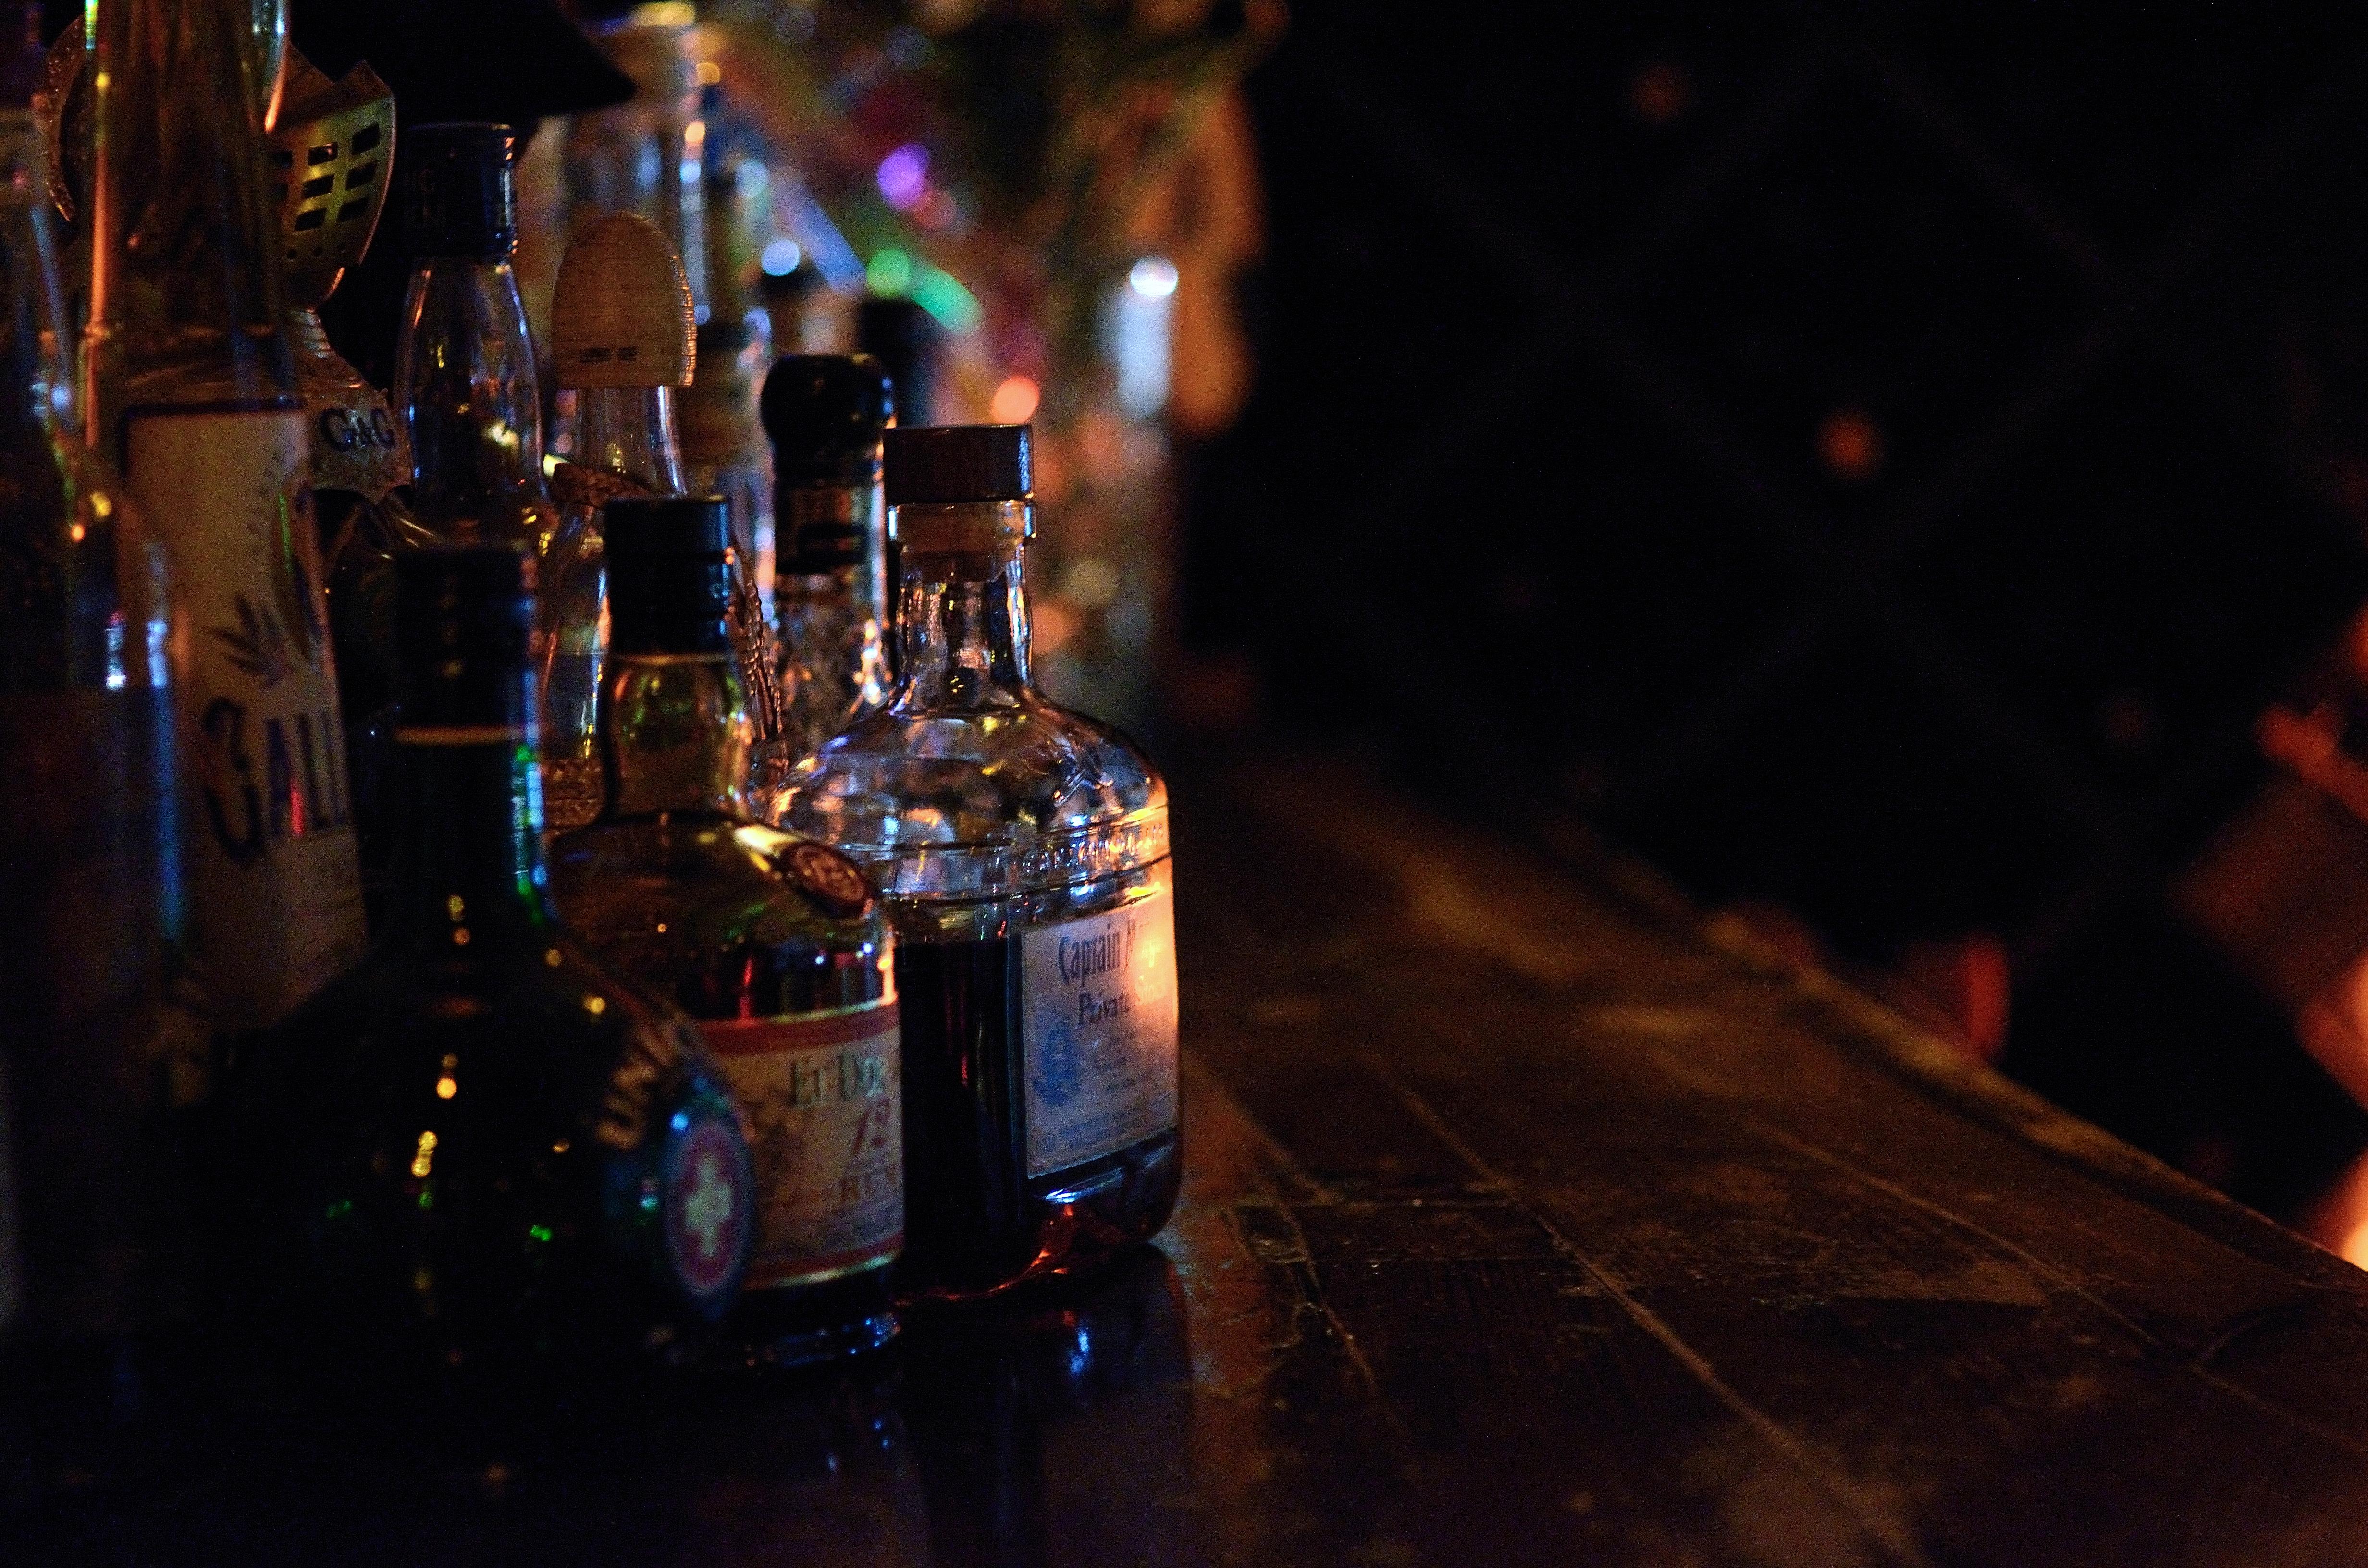 картинки виски в клубе так